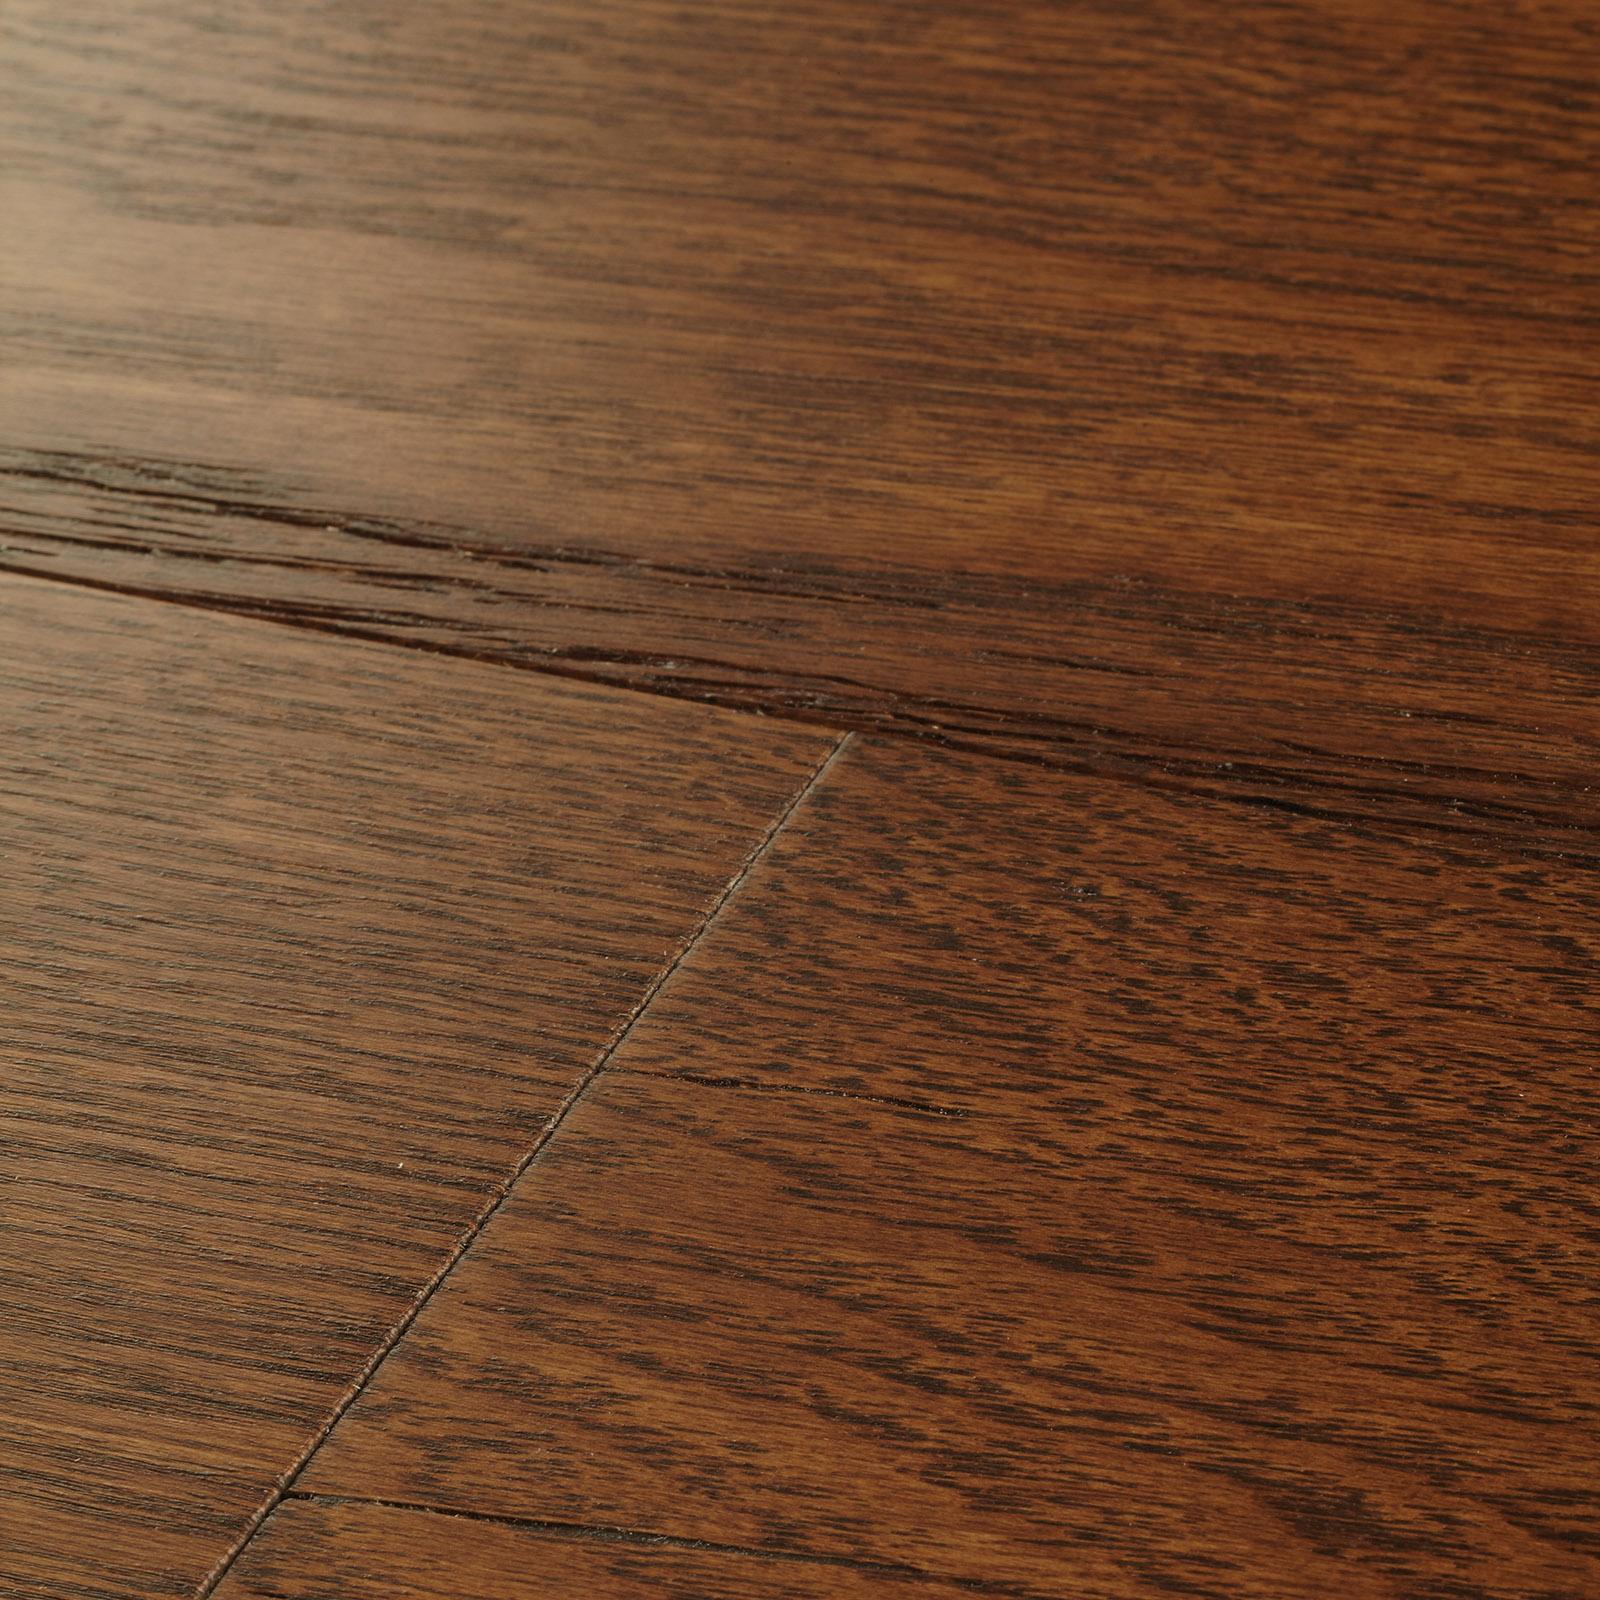 Engineered wood flooring Harlech Cognac Oak